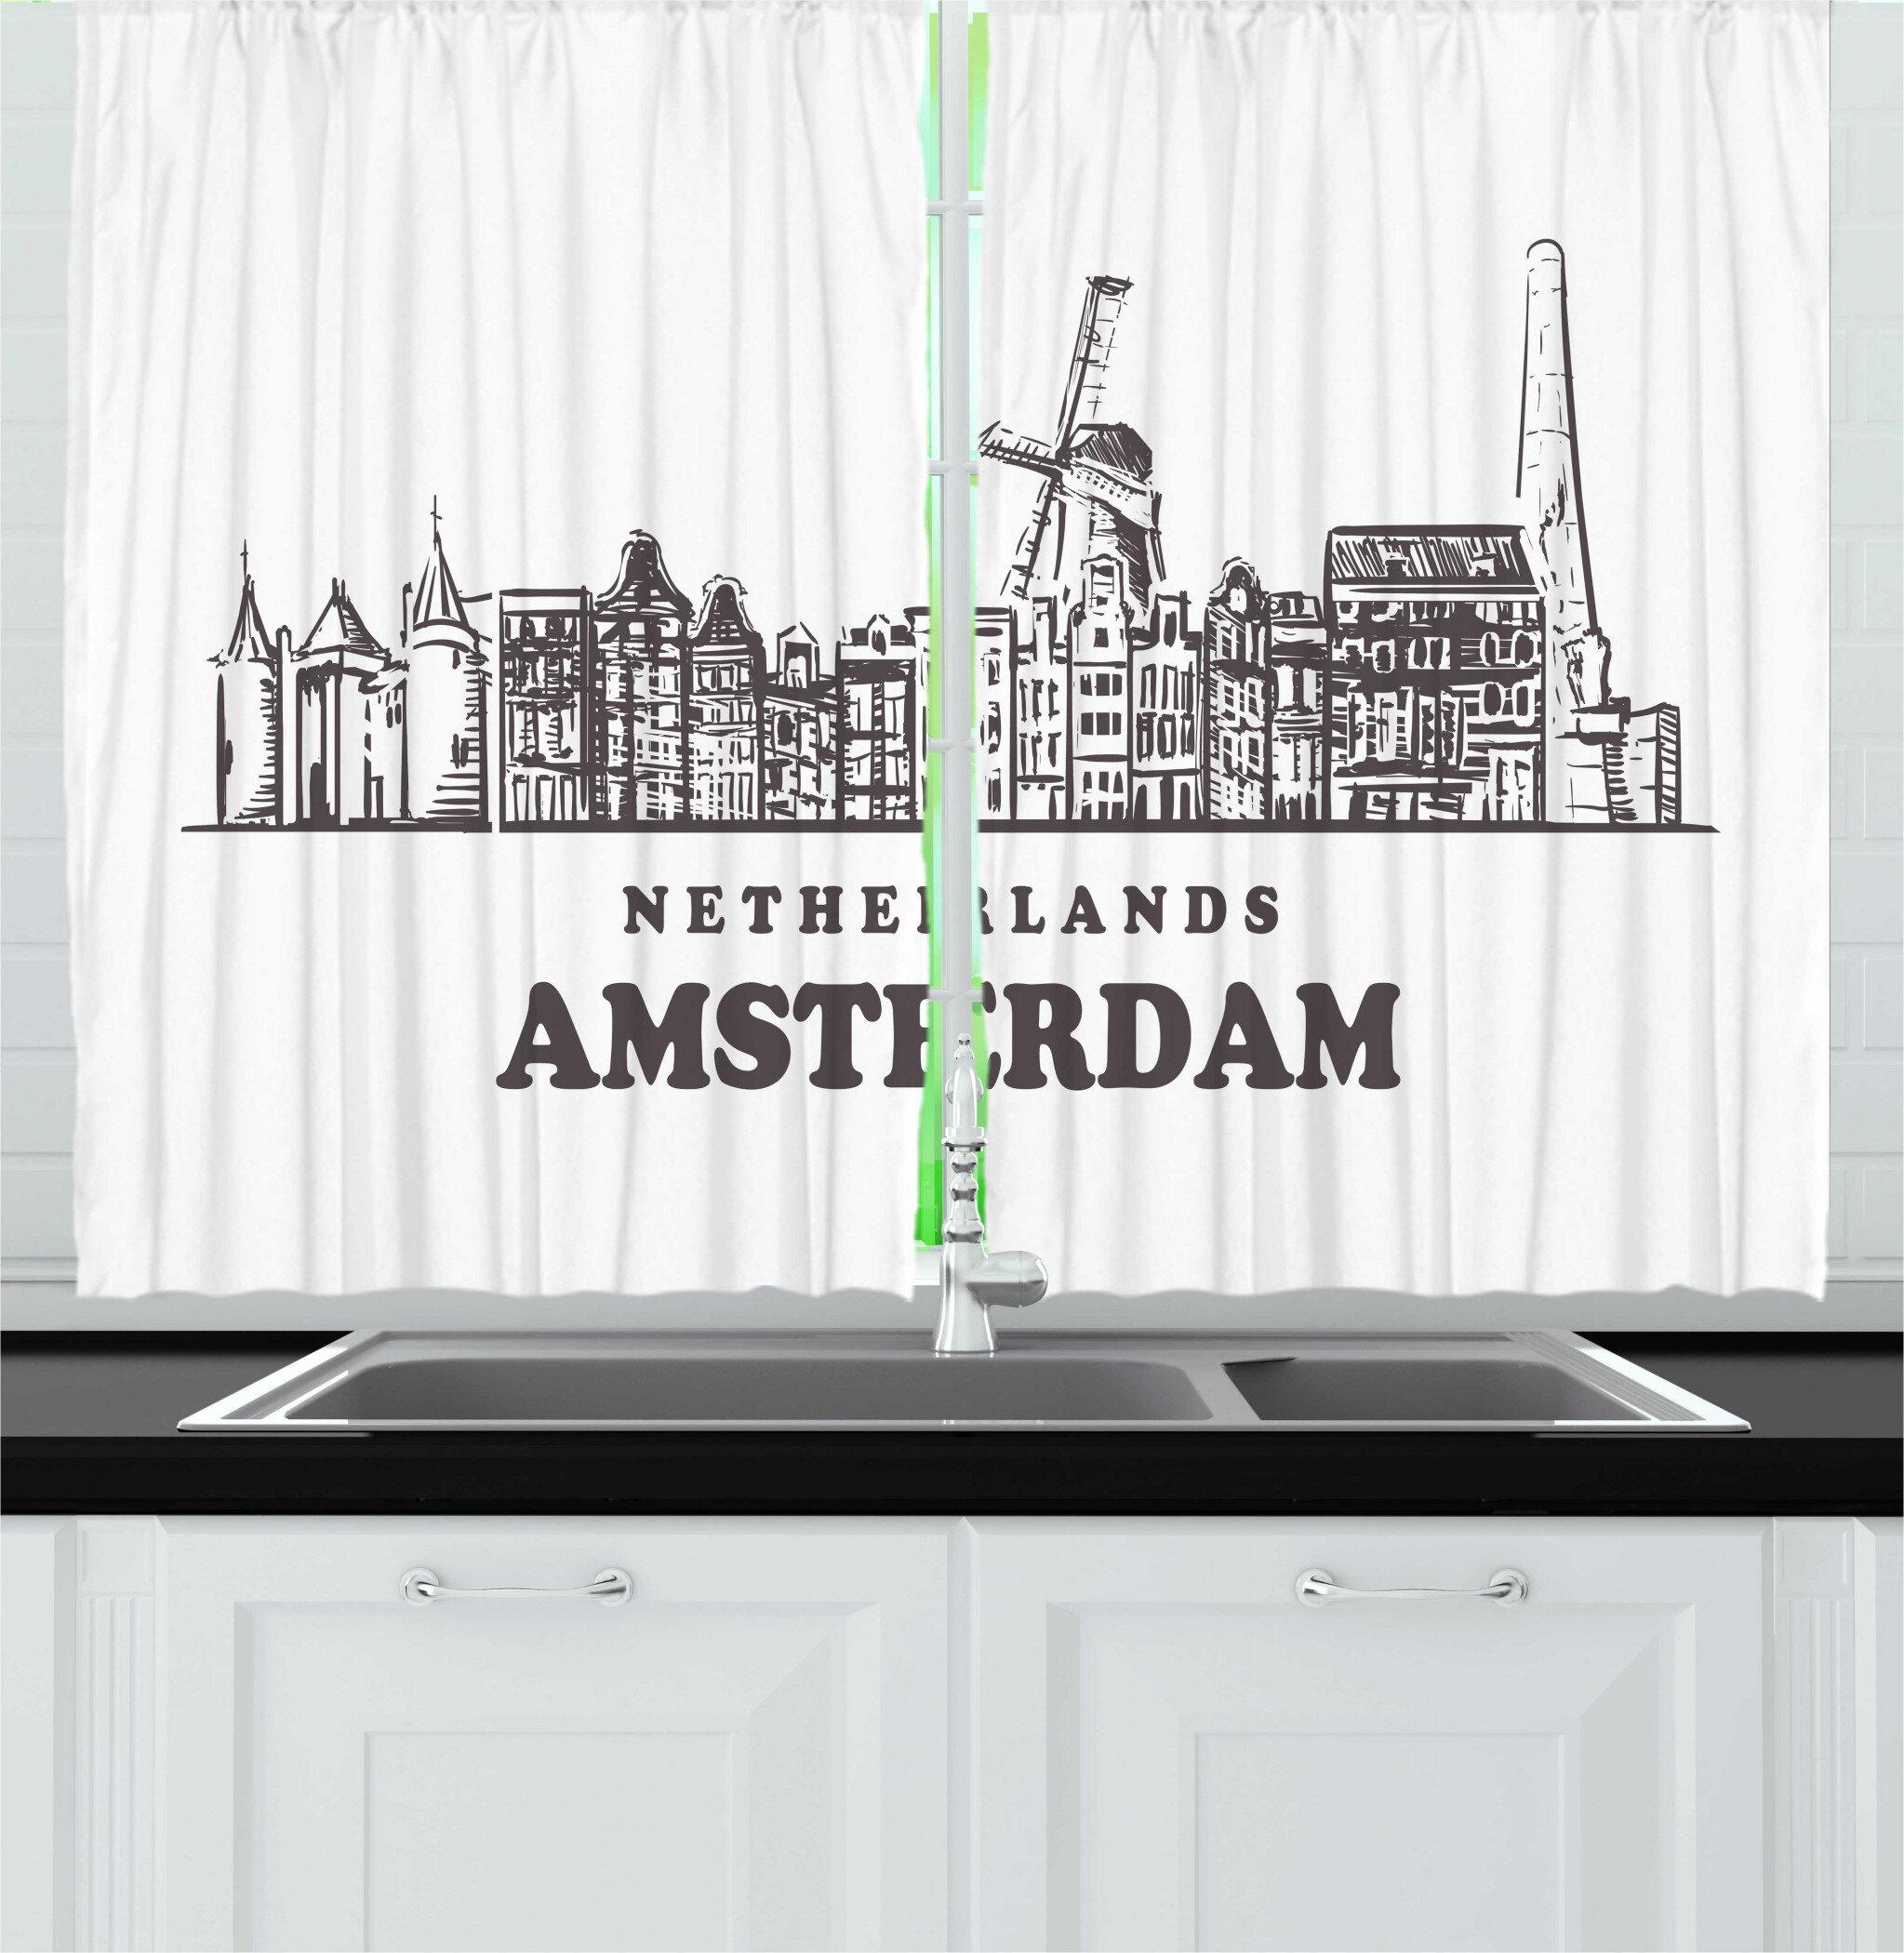 East Urban Home 2 Piece Amsterdam Netherlands Calligraphy And Horizontal City Skyline On A Plain Background Kitchen Curtain Set Wayfair